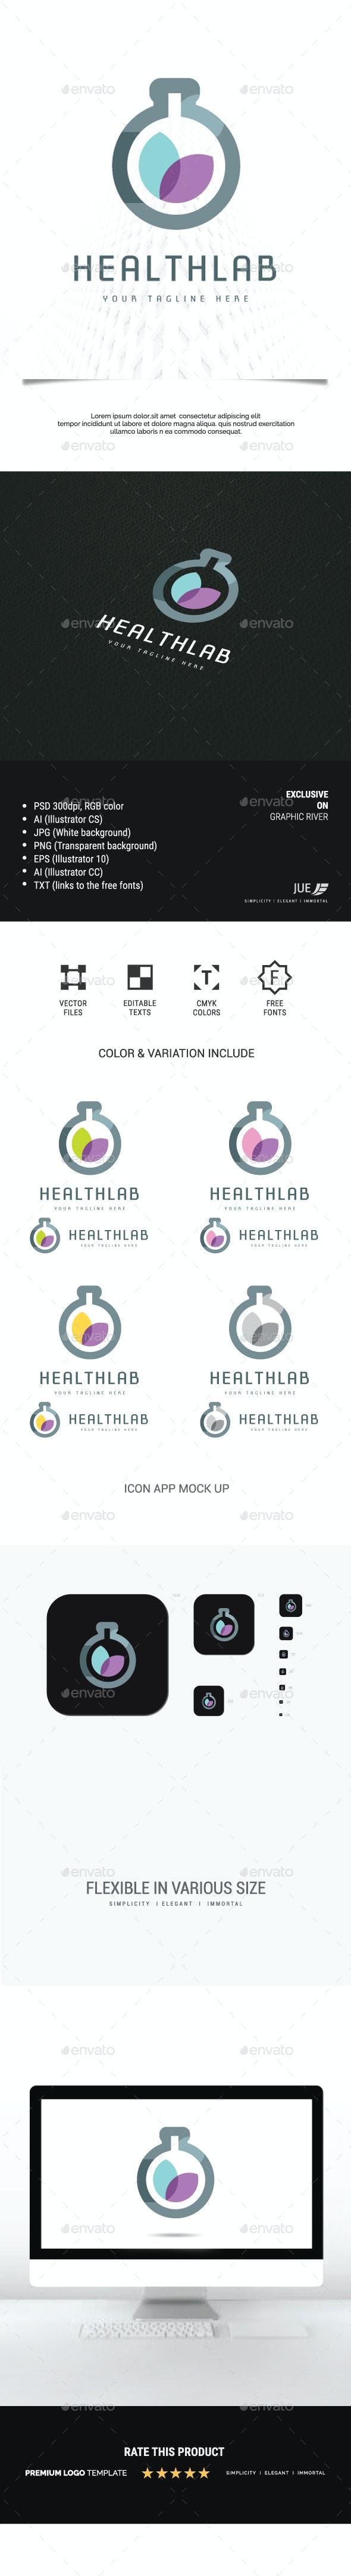 Health Lab Logo - Nature Logo Templates